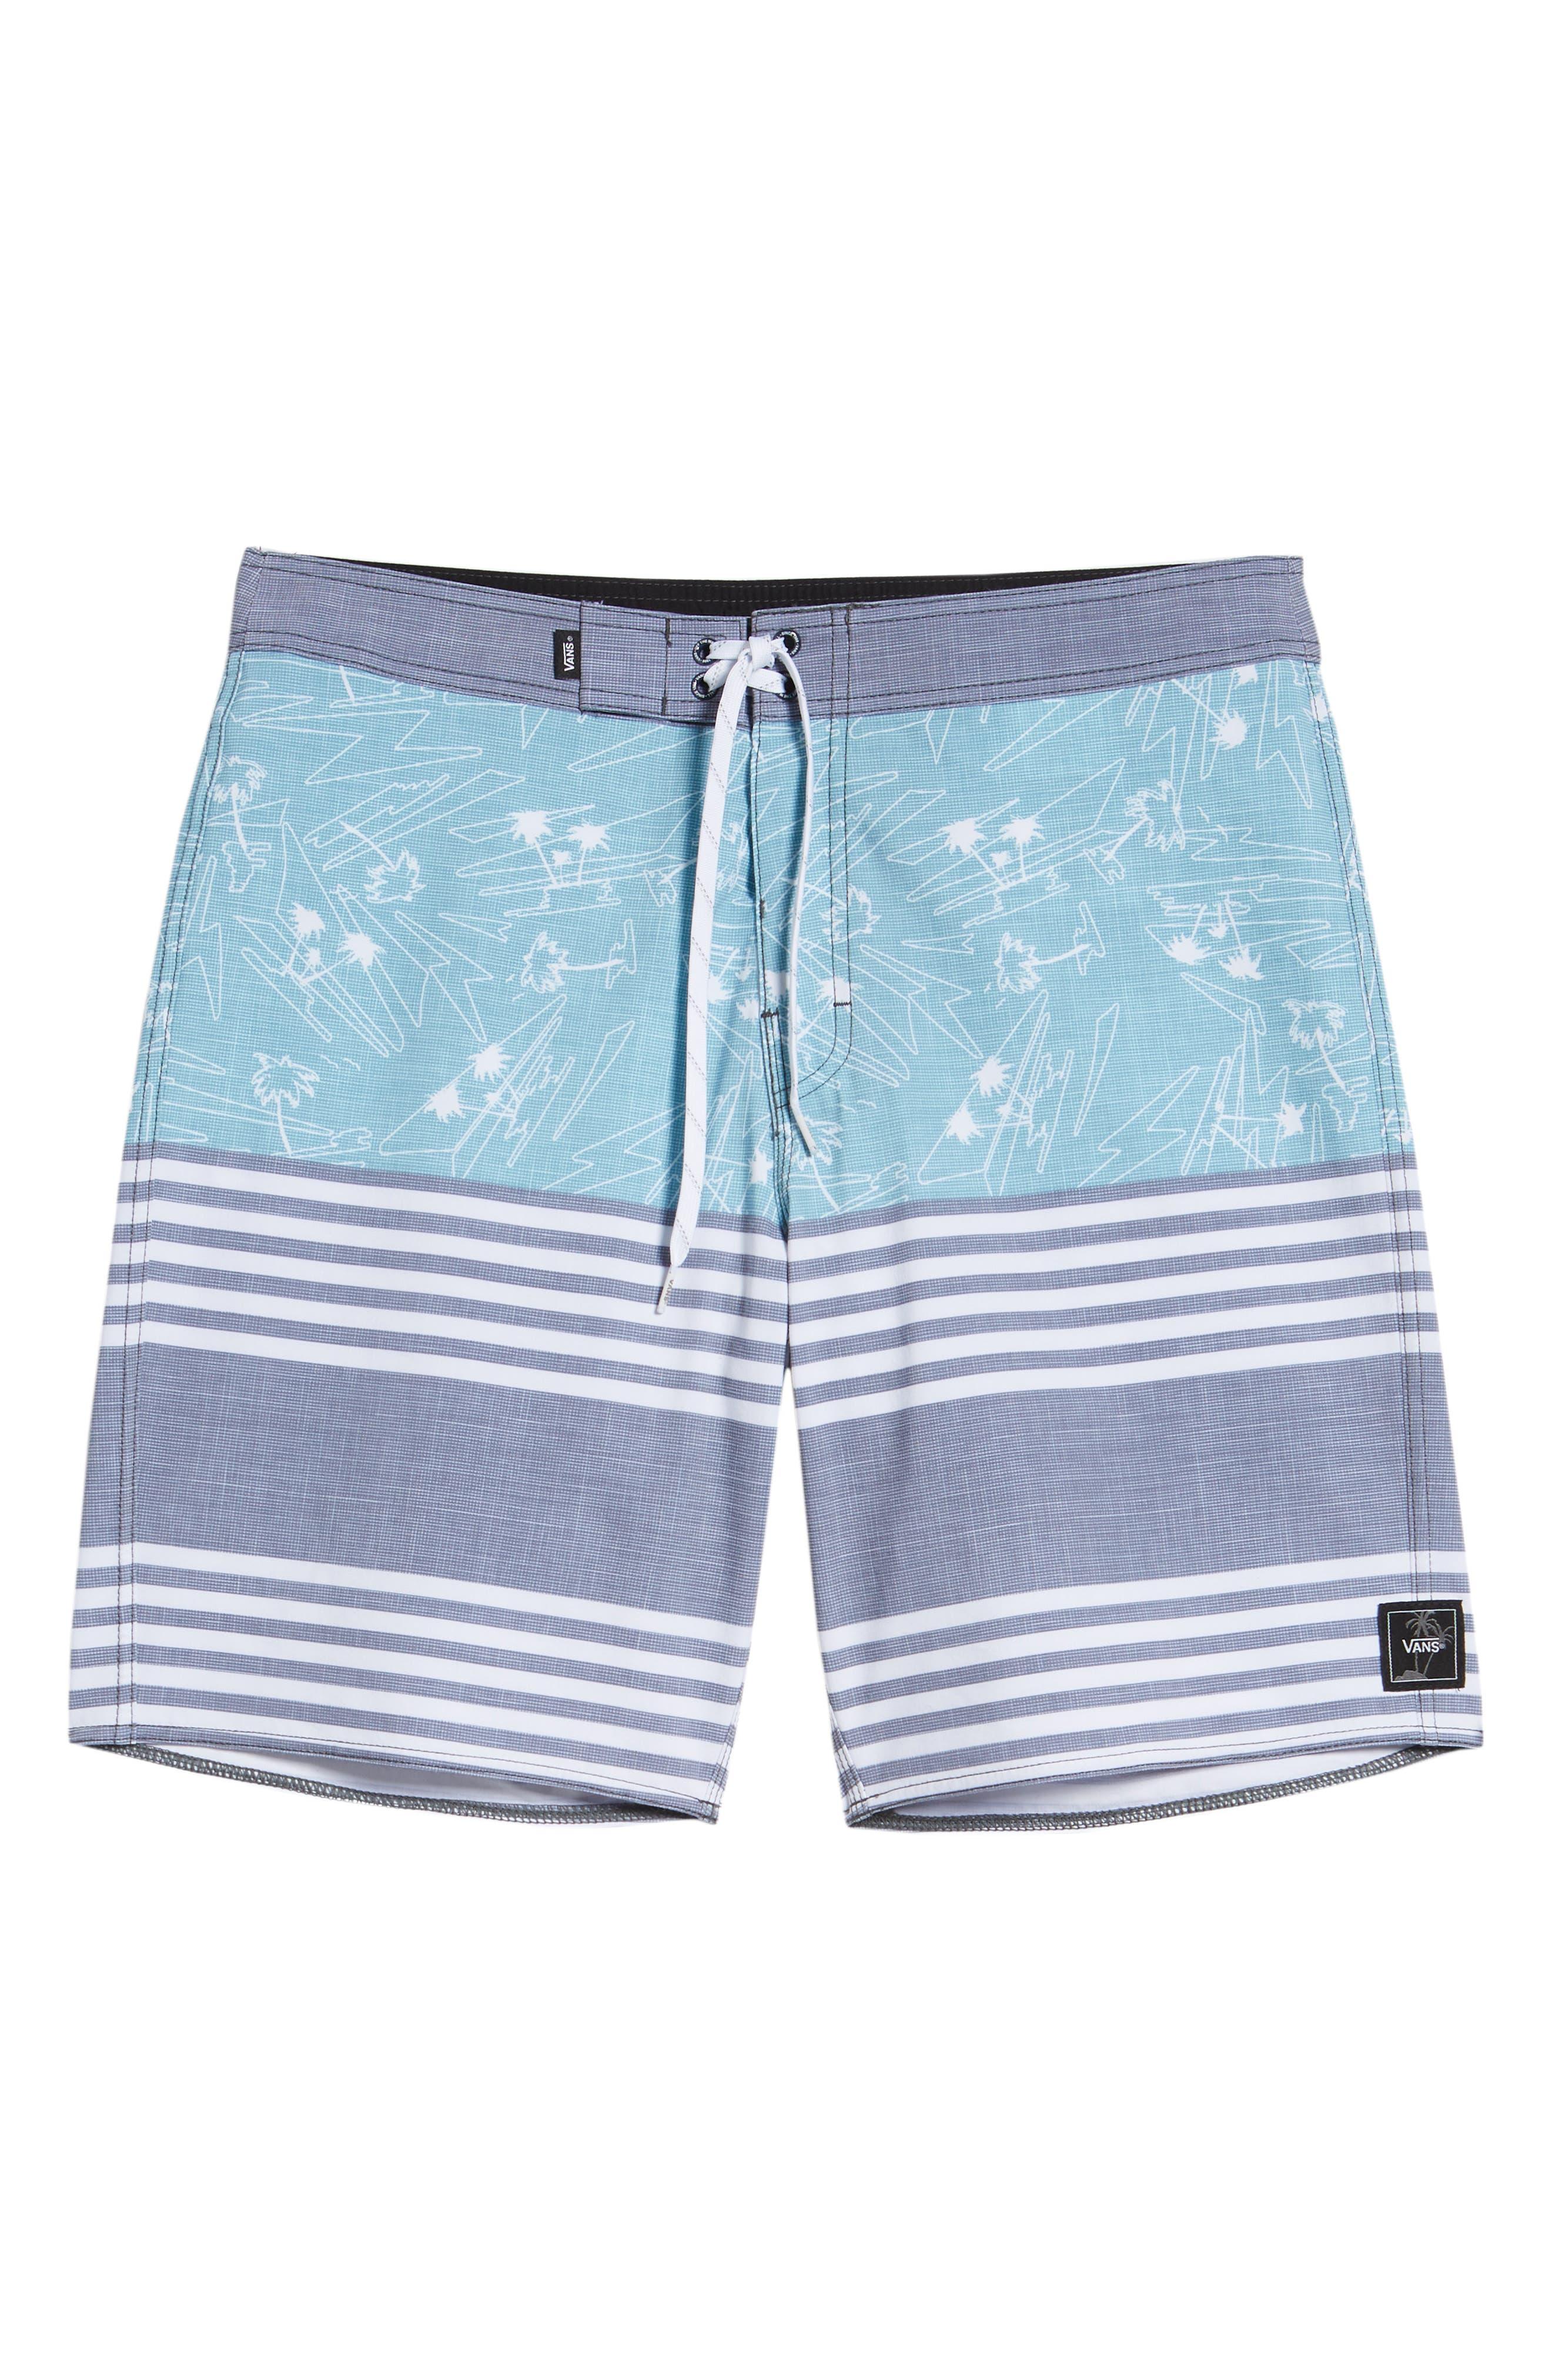 Era Board Shorts,                             Alternate thumbnail 6, color,                             DRESS BLUES ISLAND BEACH